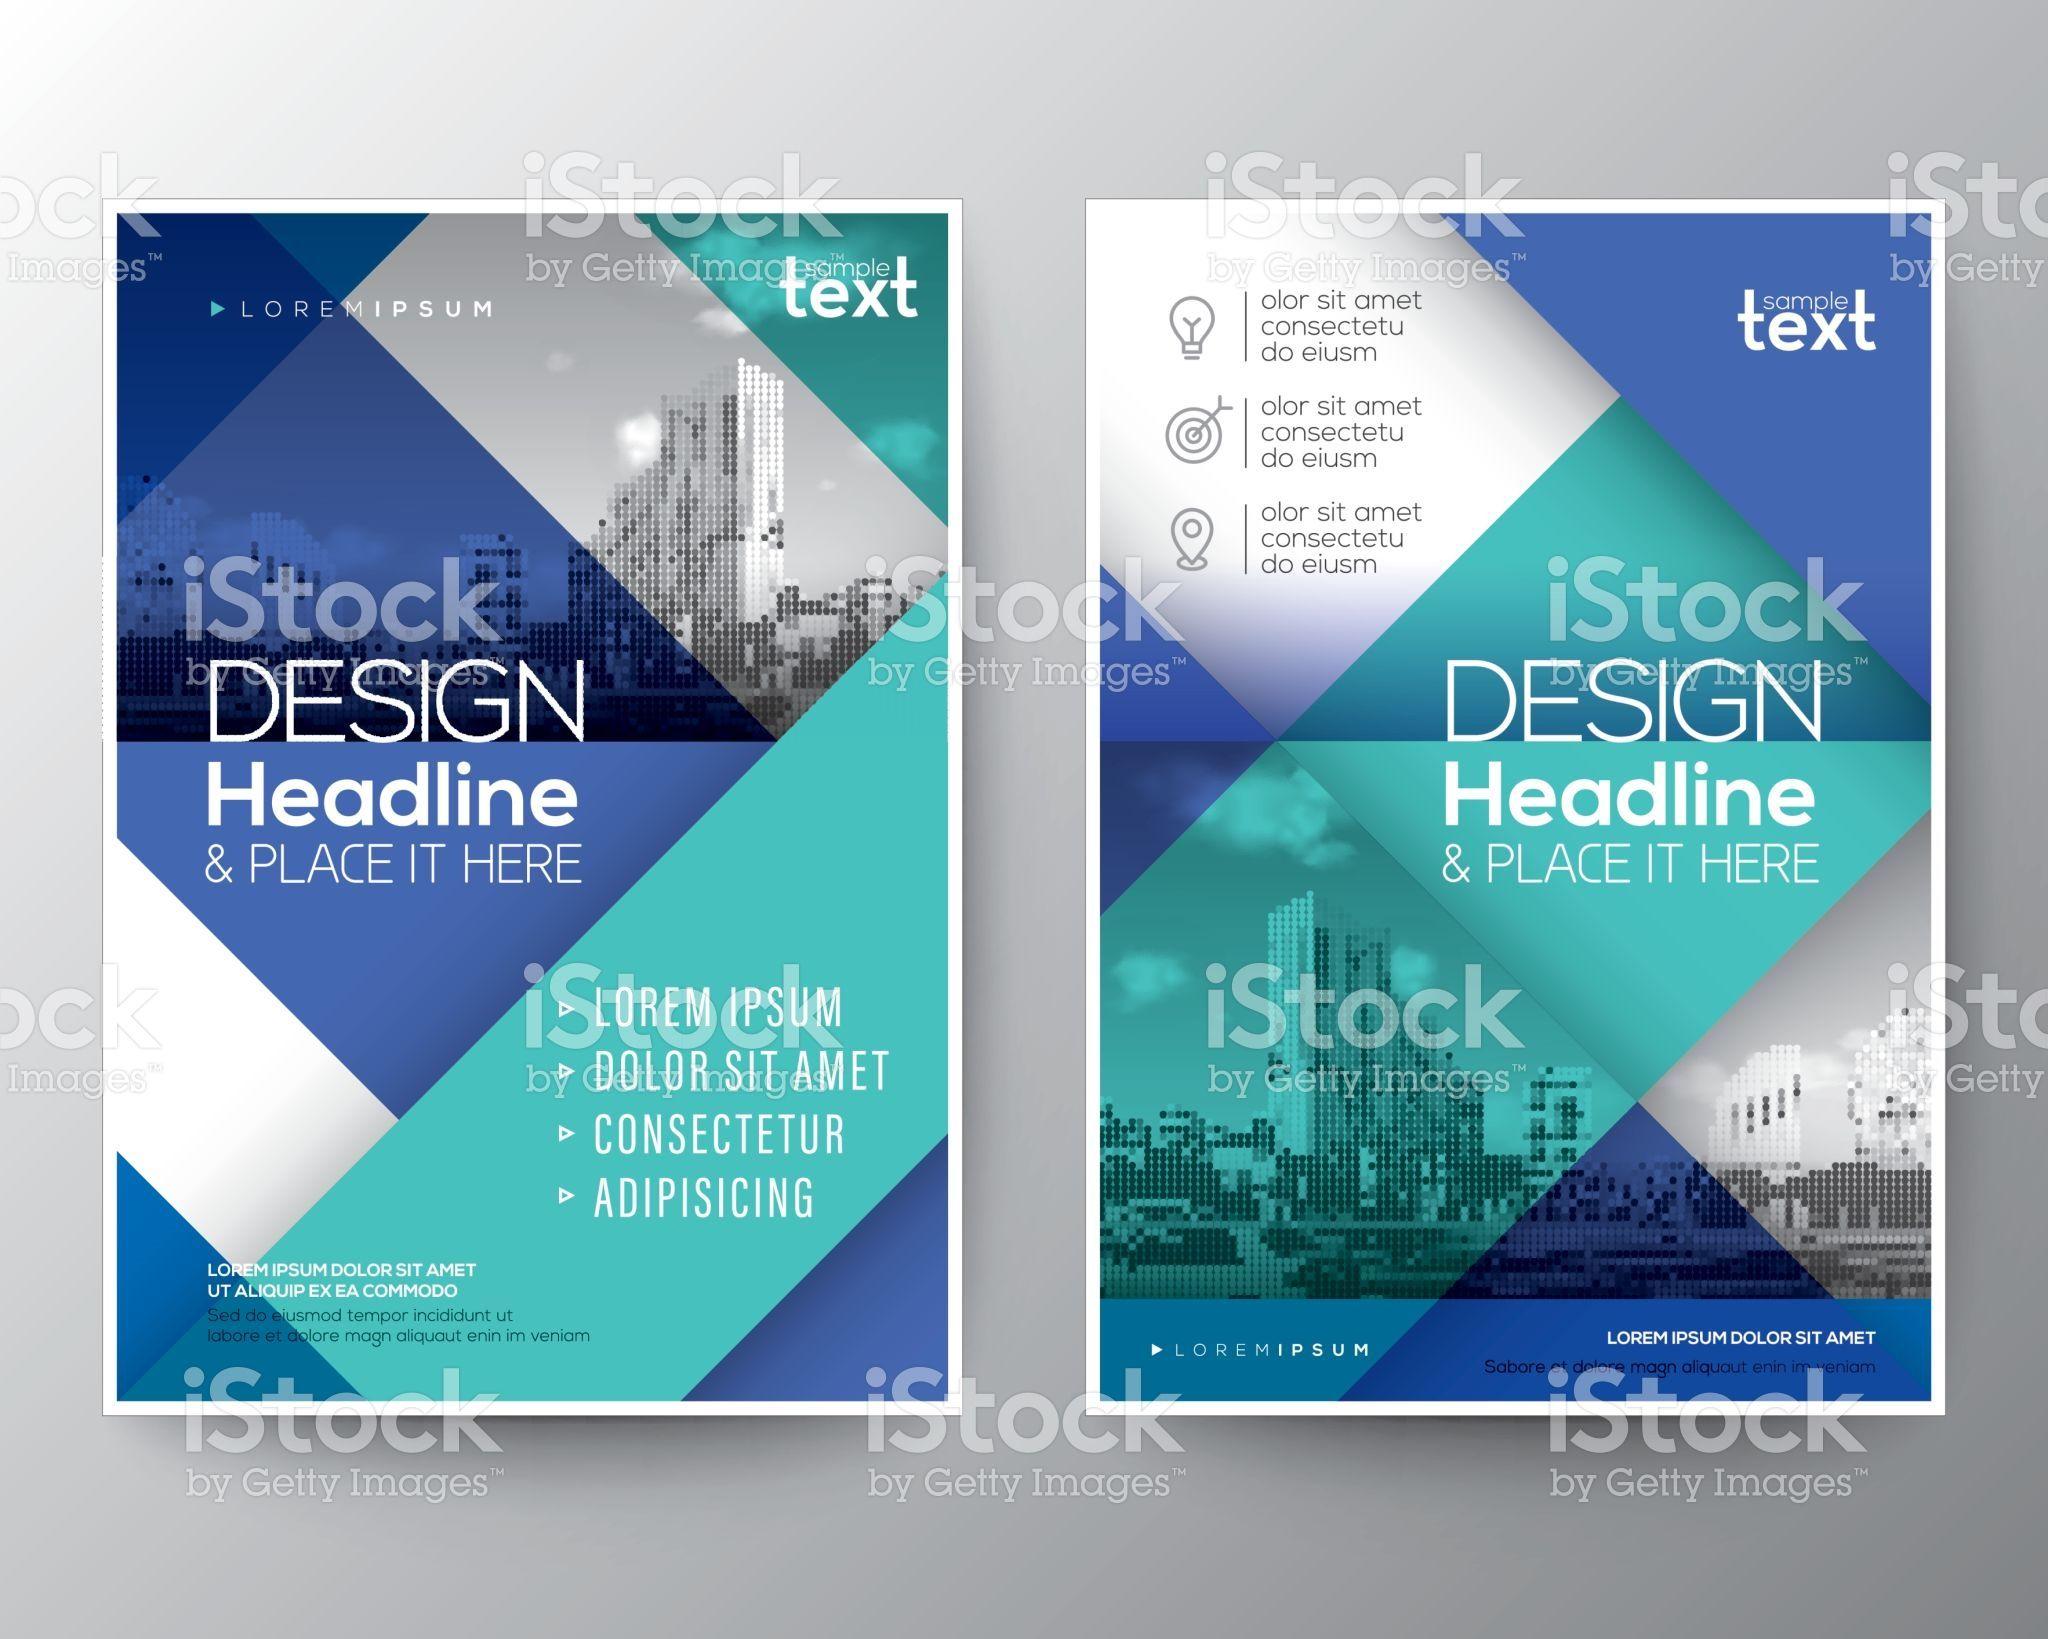 Line Art Poster Design : Back school banner poster design empty stock vector